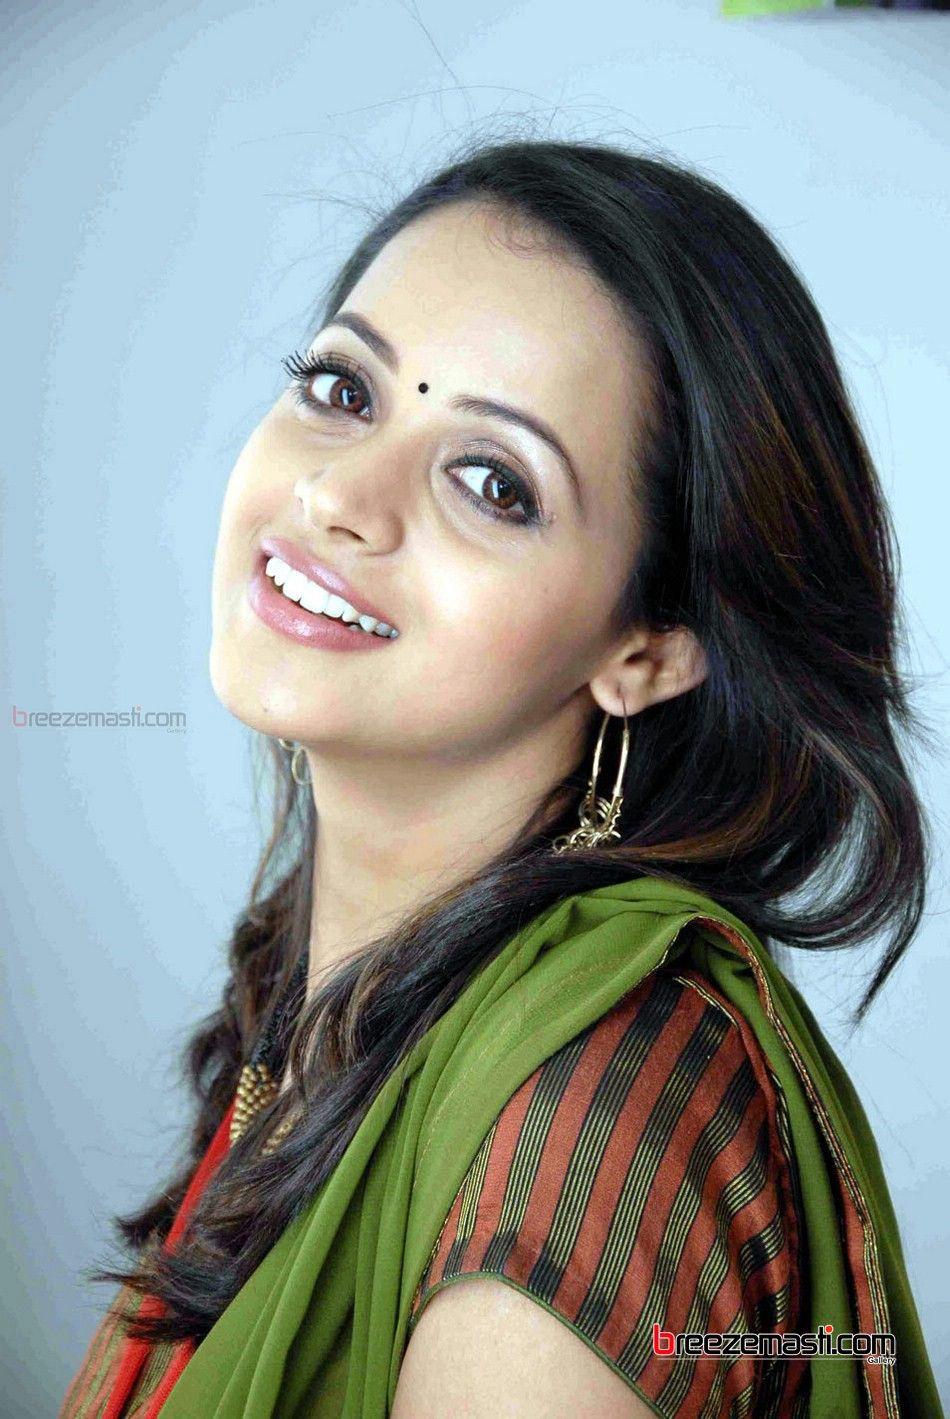 pinayyappan krishnakumar on actresscentre13 | pinterest | girls